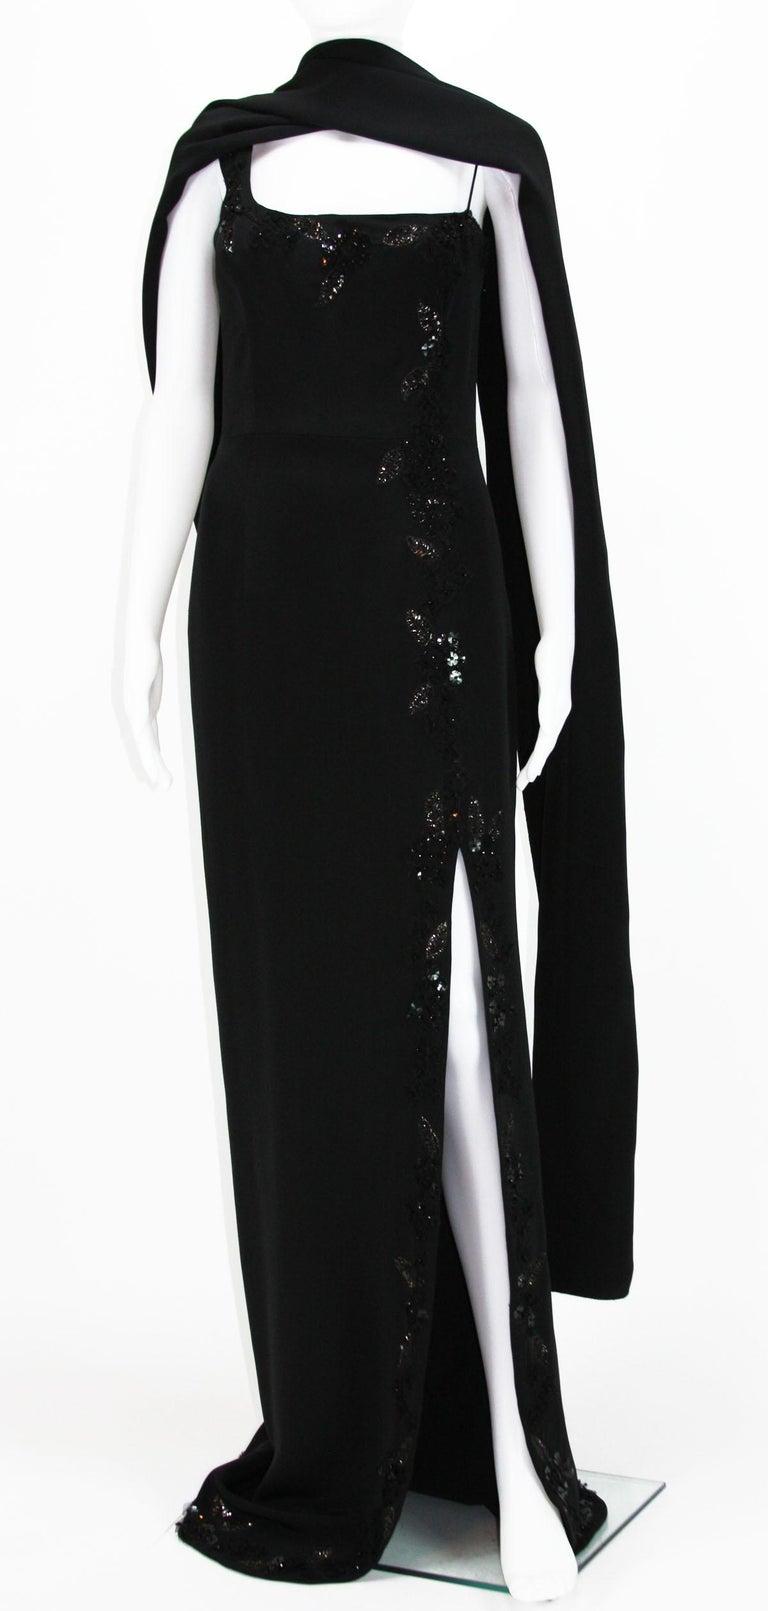 New $7500 L'WREN SCOTT S/S 2010 Represent Her *MADAME DU BARRY* Black Dress Gown For Sale 1